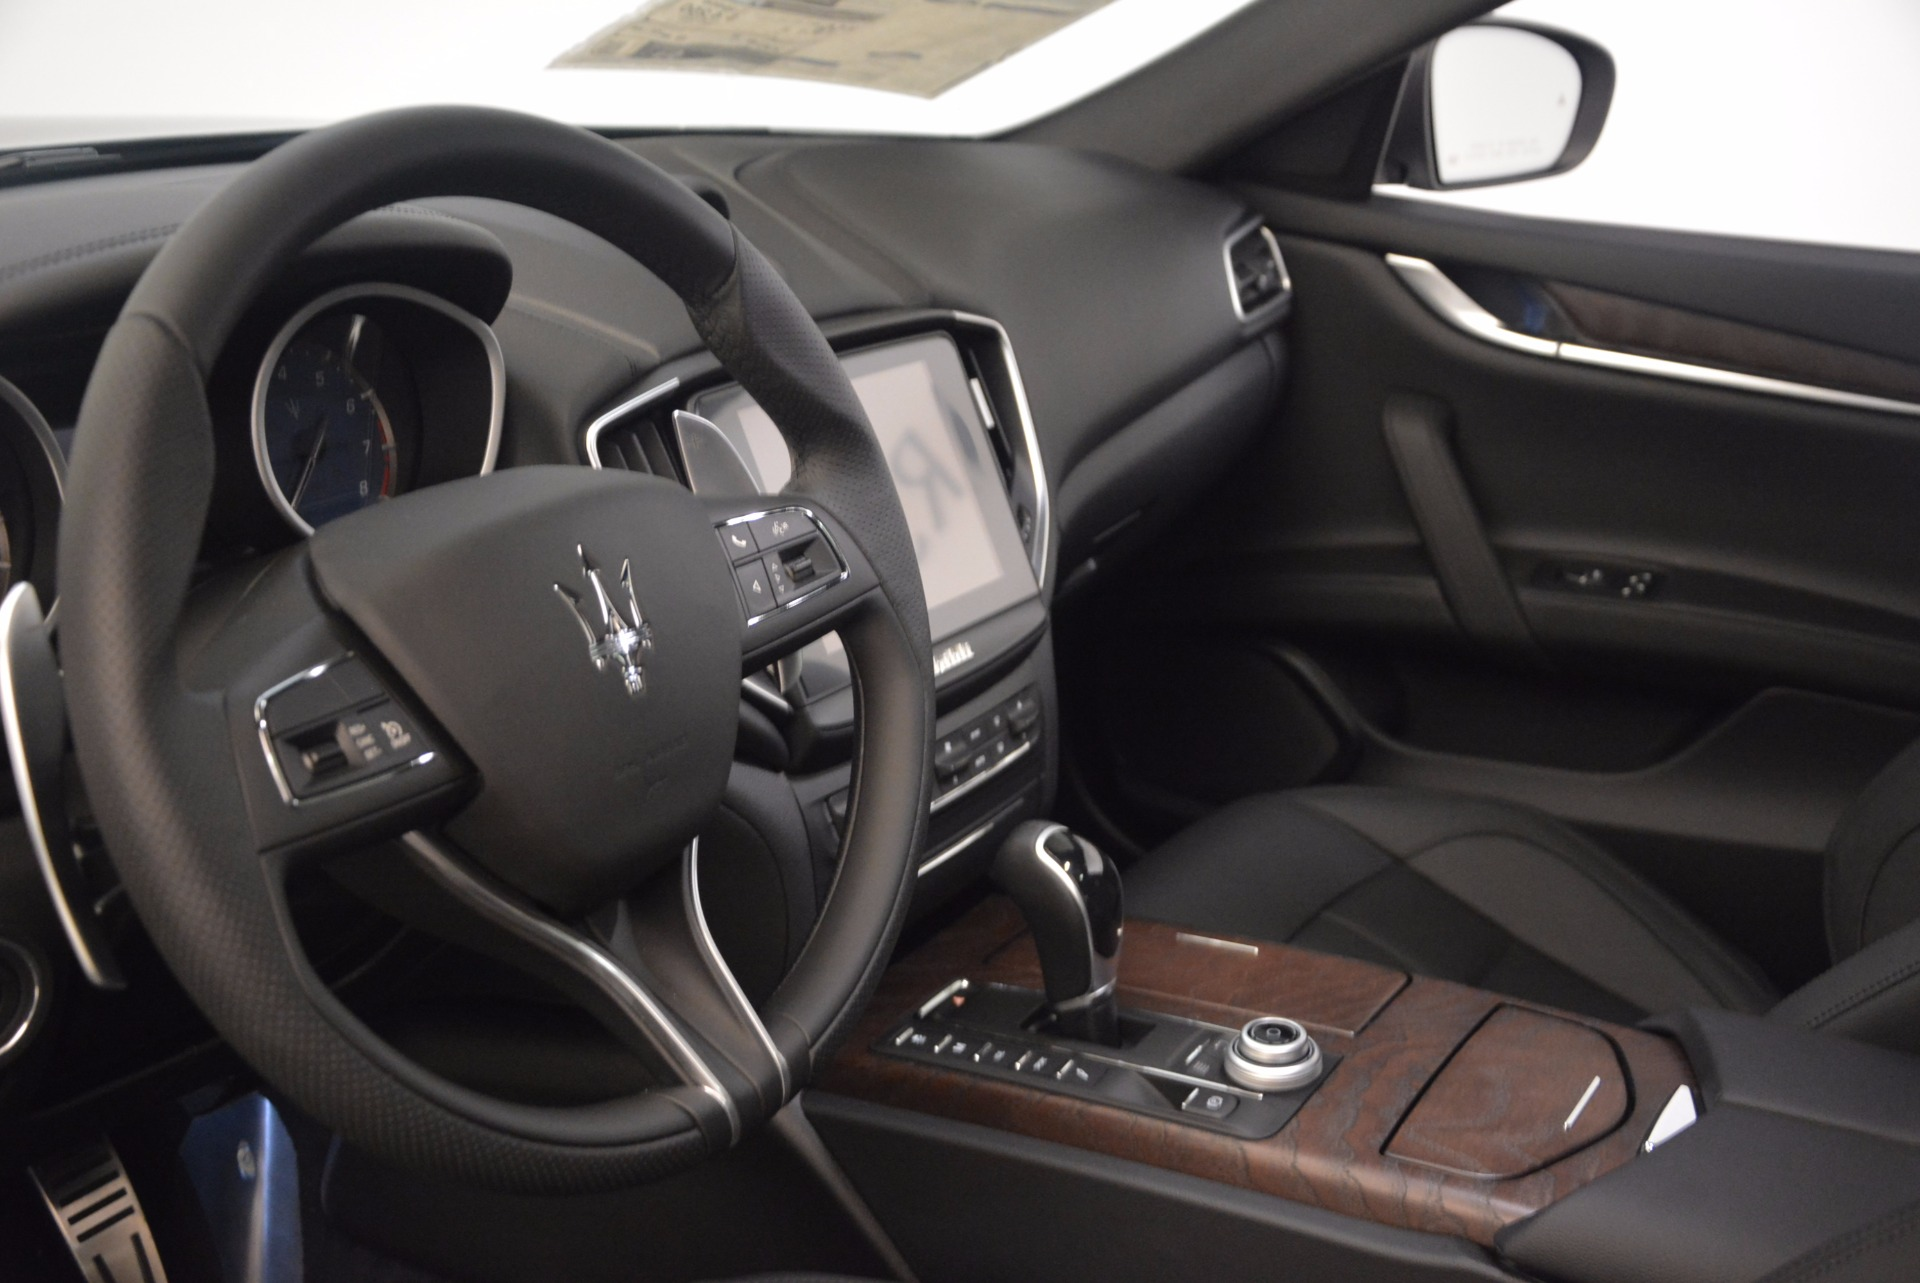 Used 2018 Maserati Ghibli S Q4 Gransport For Sale In Westport, CT 1568_p14